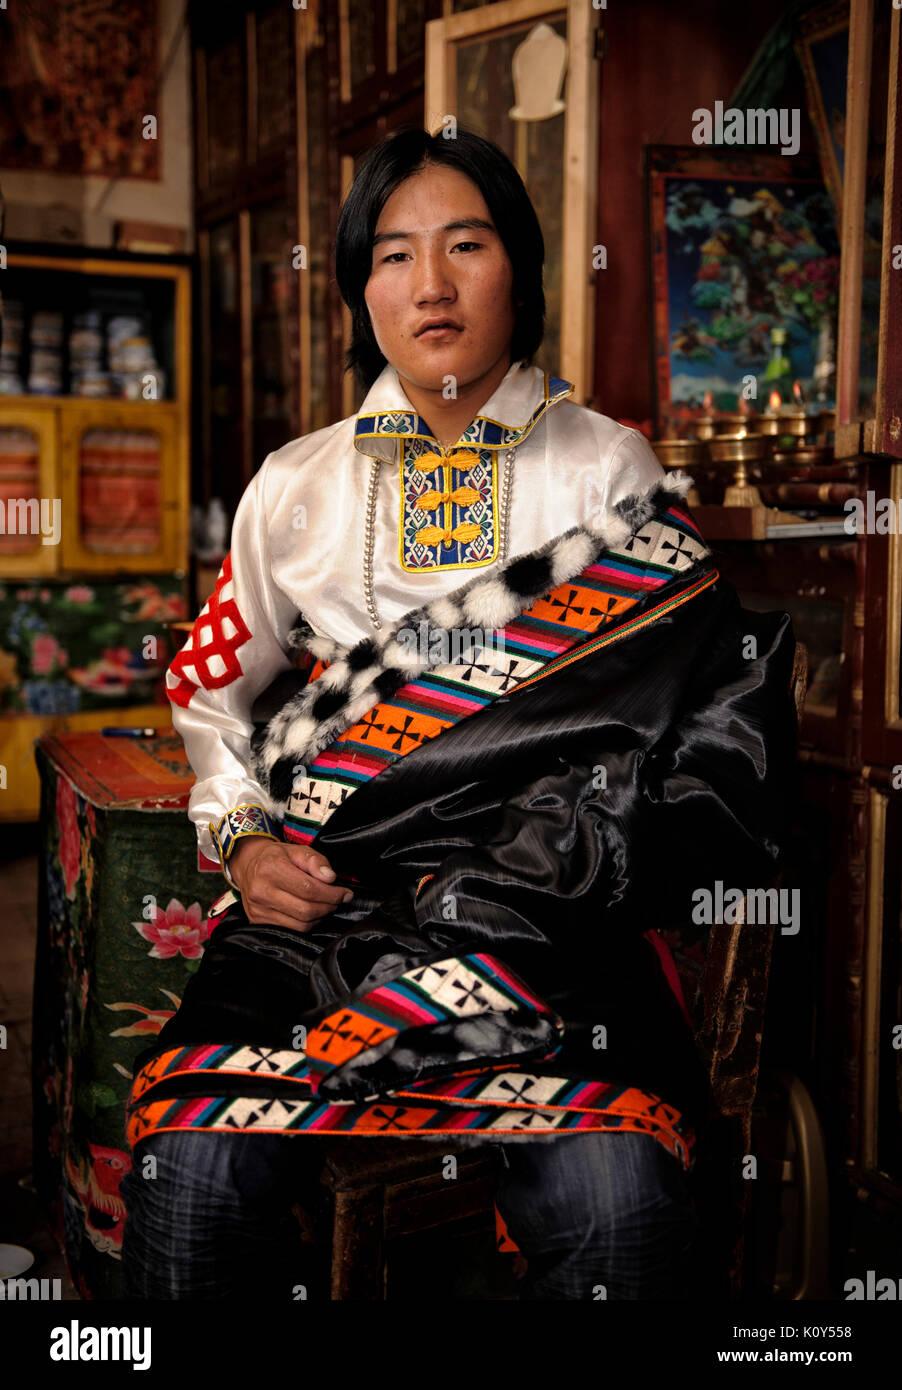 A Tibetan groom before his wedding. Stock Photo